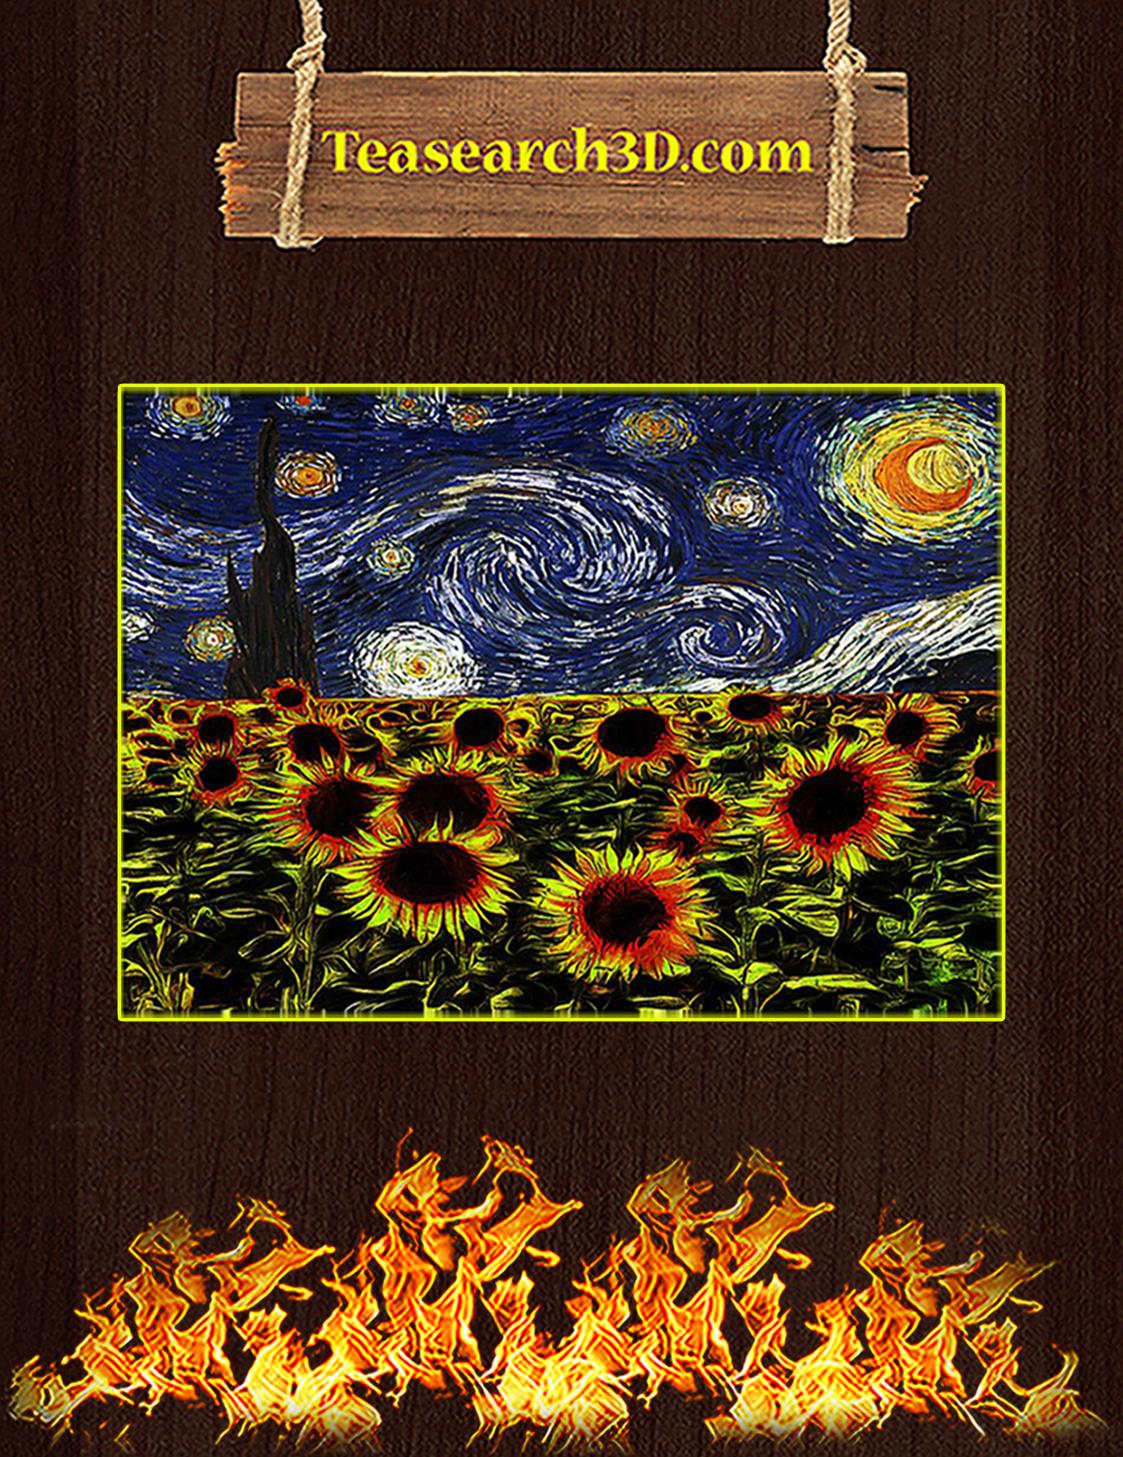 Sunflowers starry night van gogh poster A3